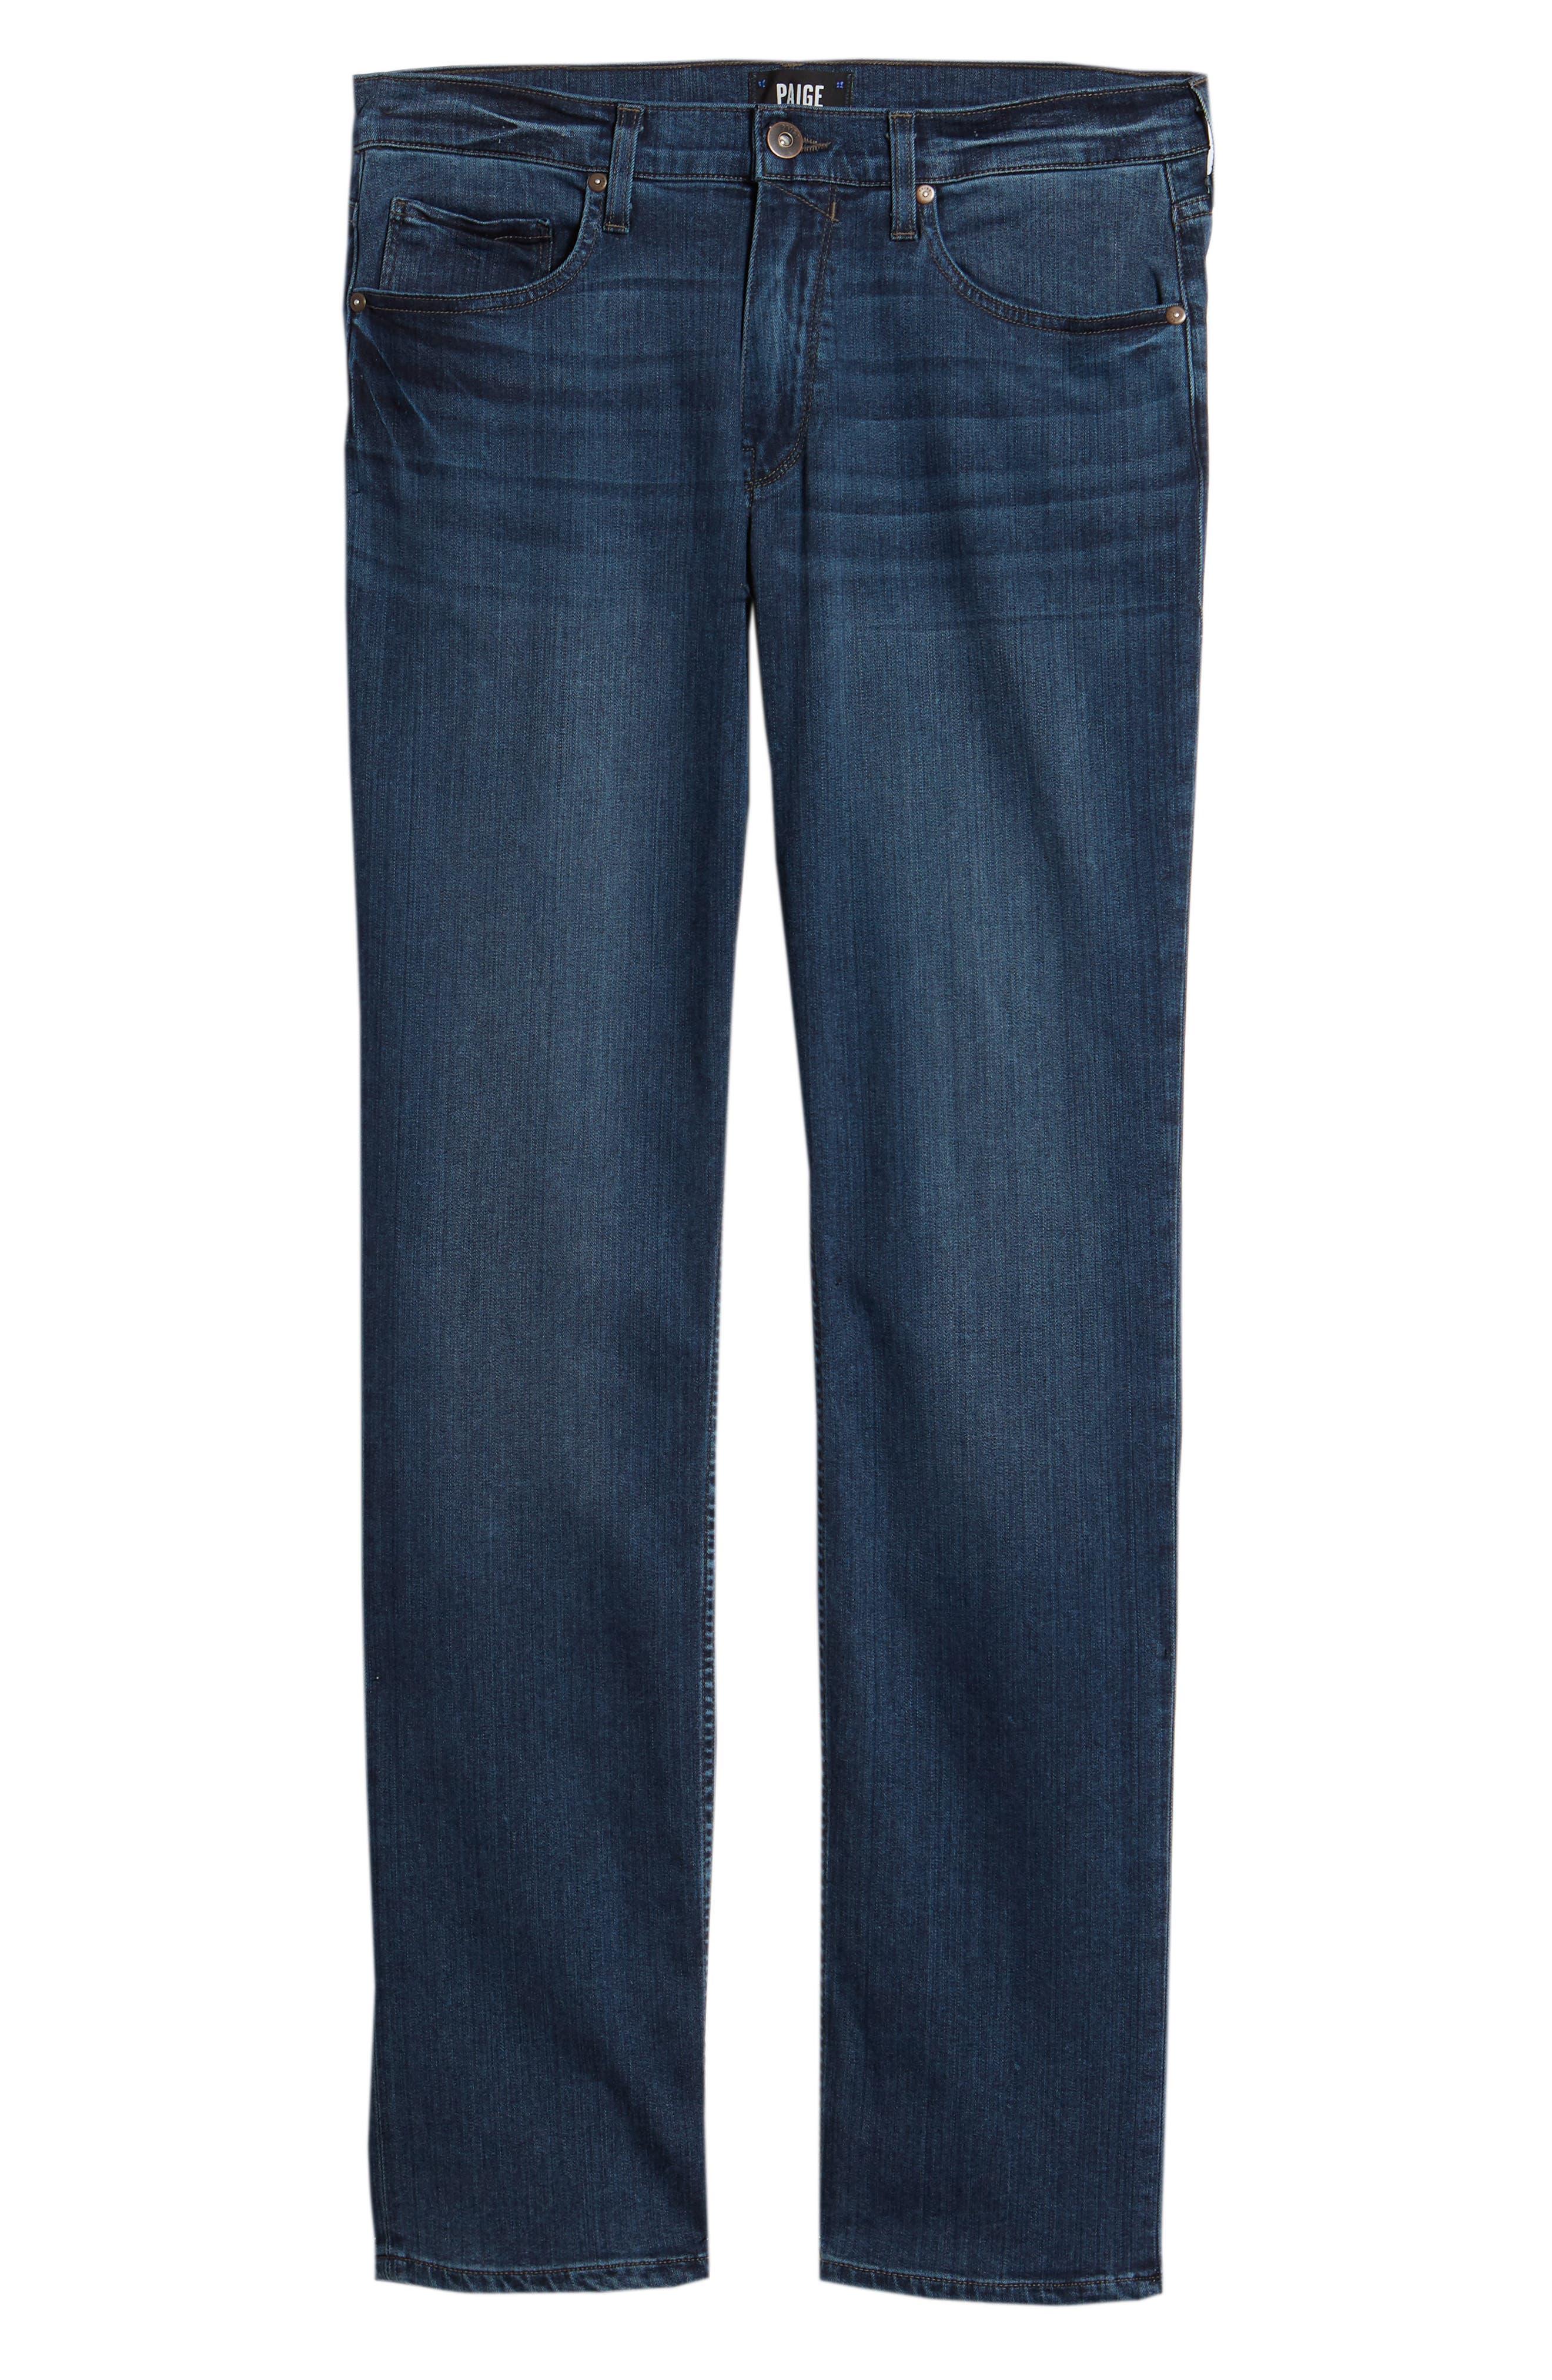 Normandie Straight Leg Jeans,                             Alternate thumbnail 6, color,                             Lowe